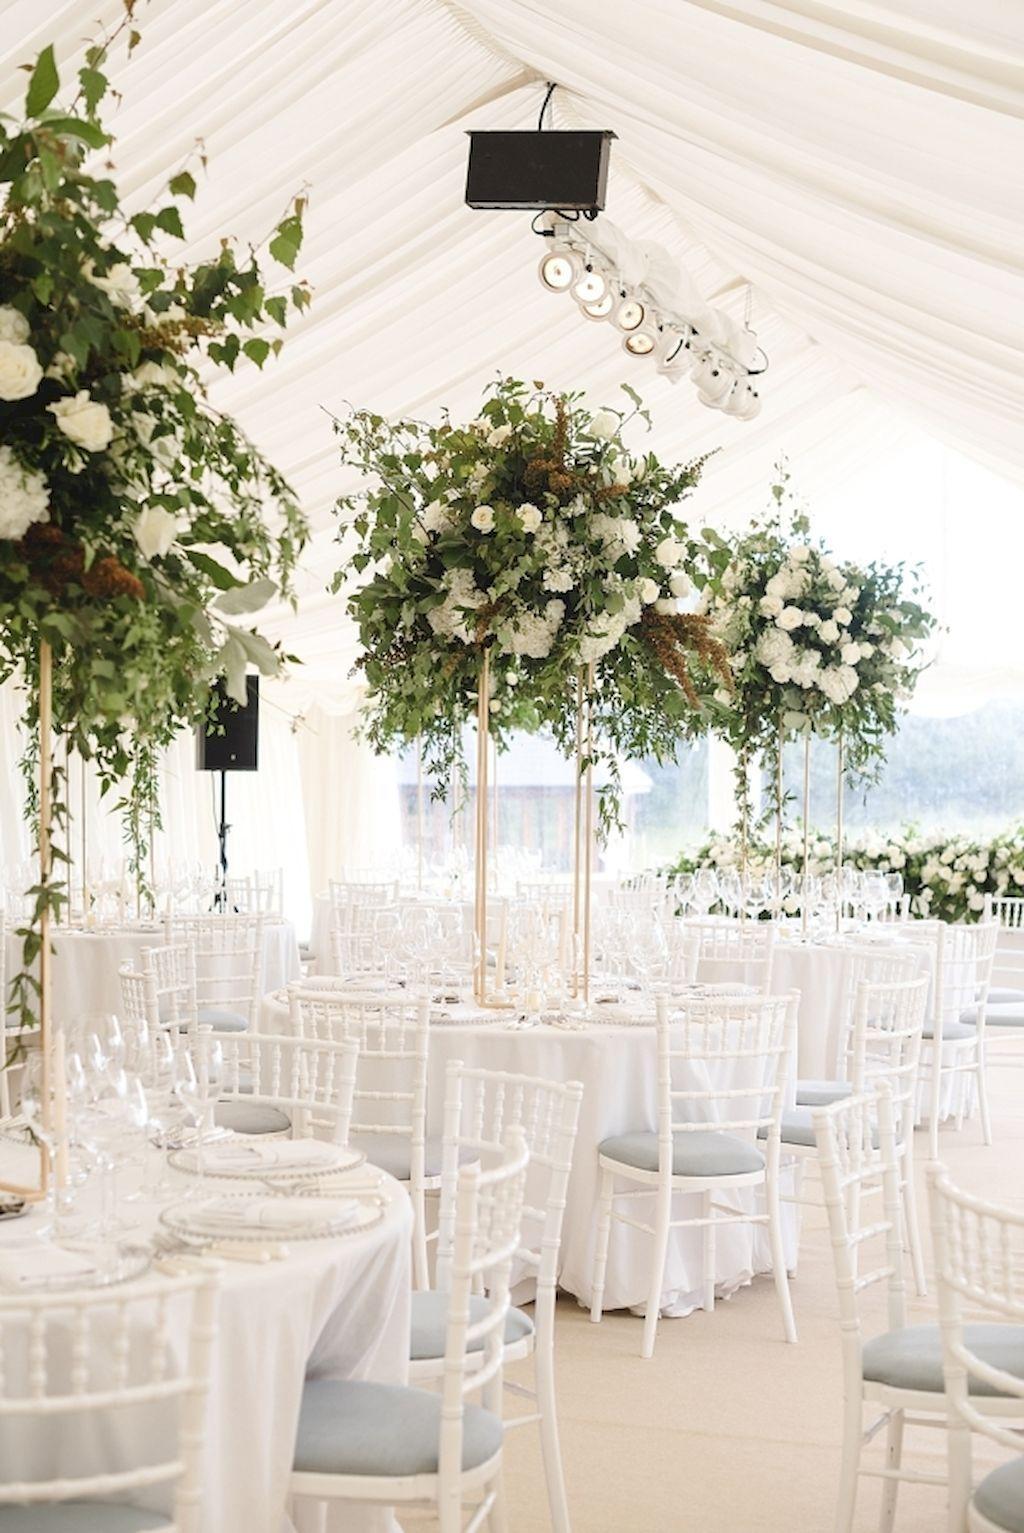 Home wedding decor ideas  Gorgeous  Best Greenery Wedding Decor Ideas bitecloth